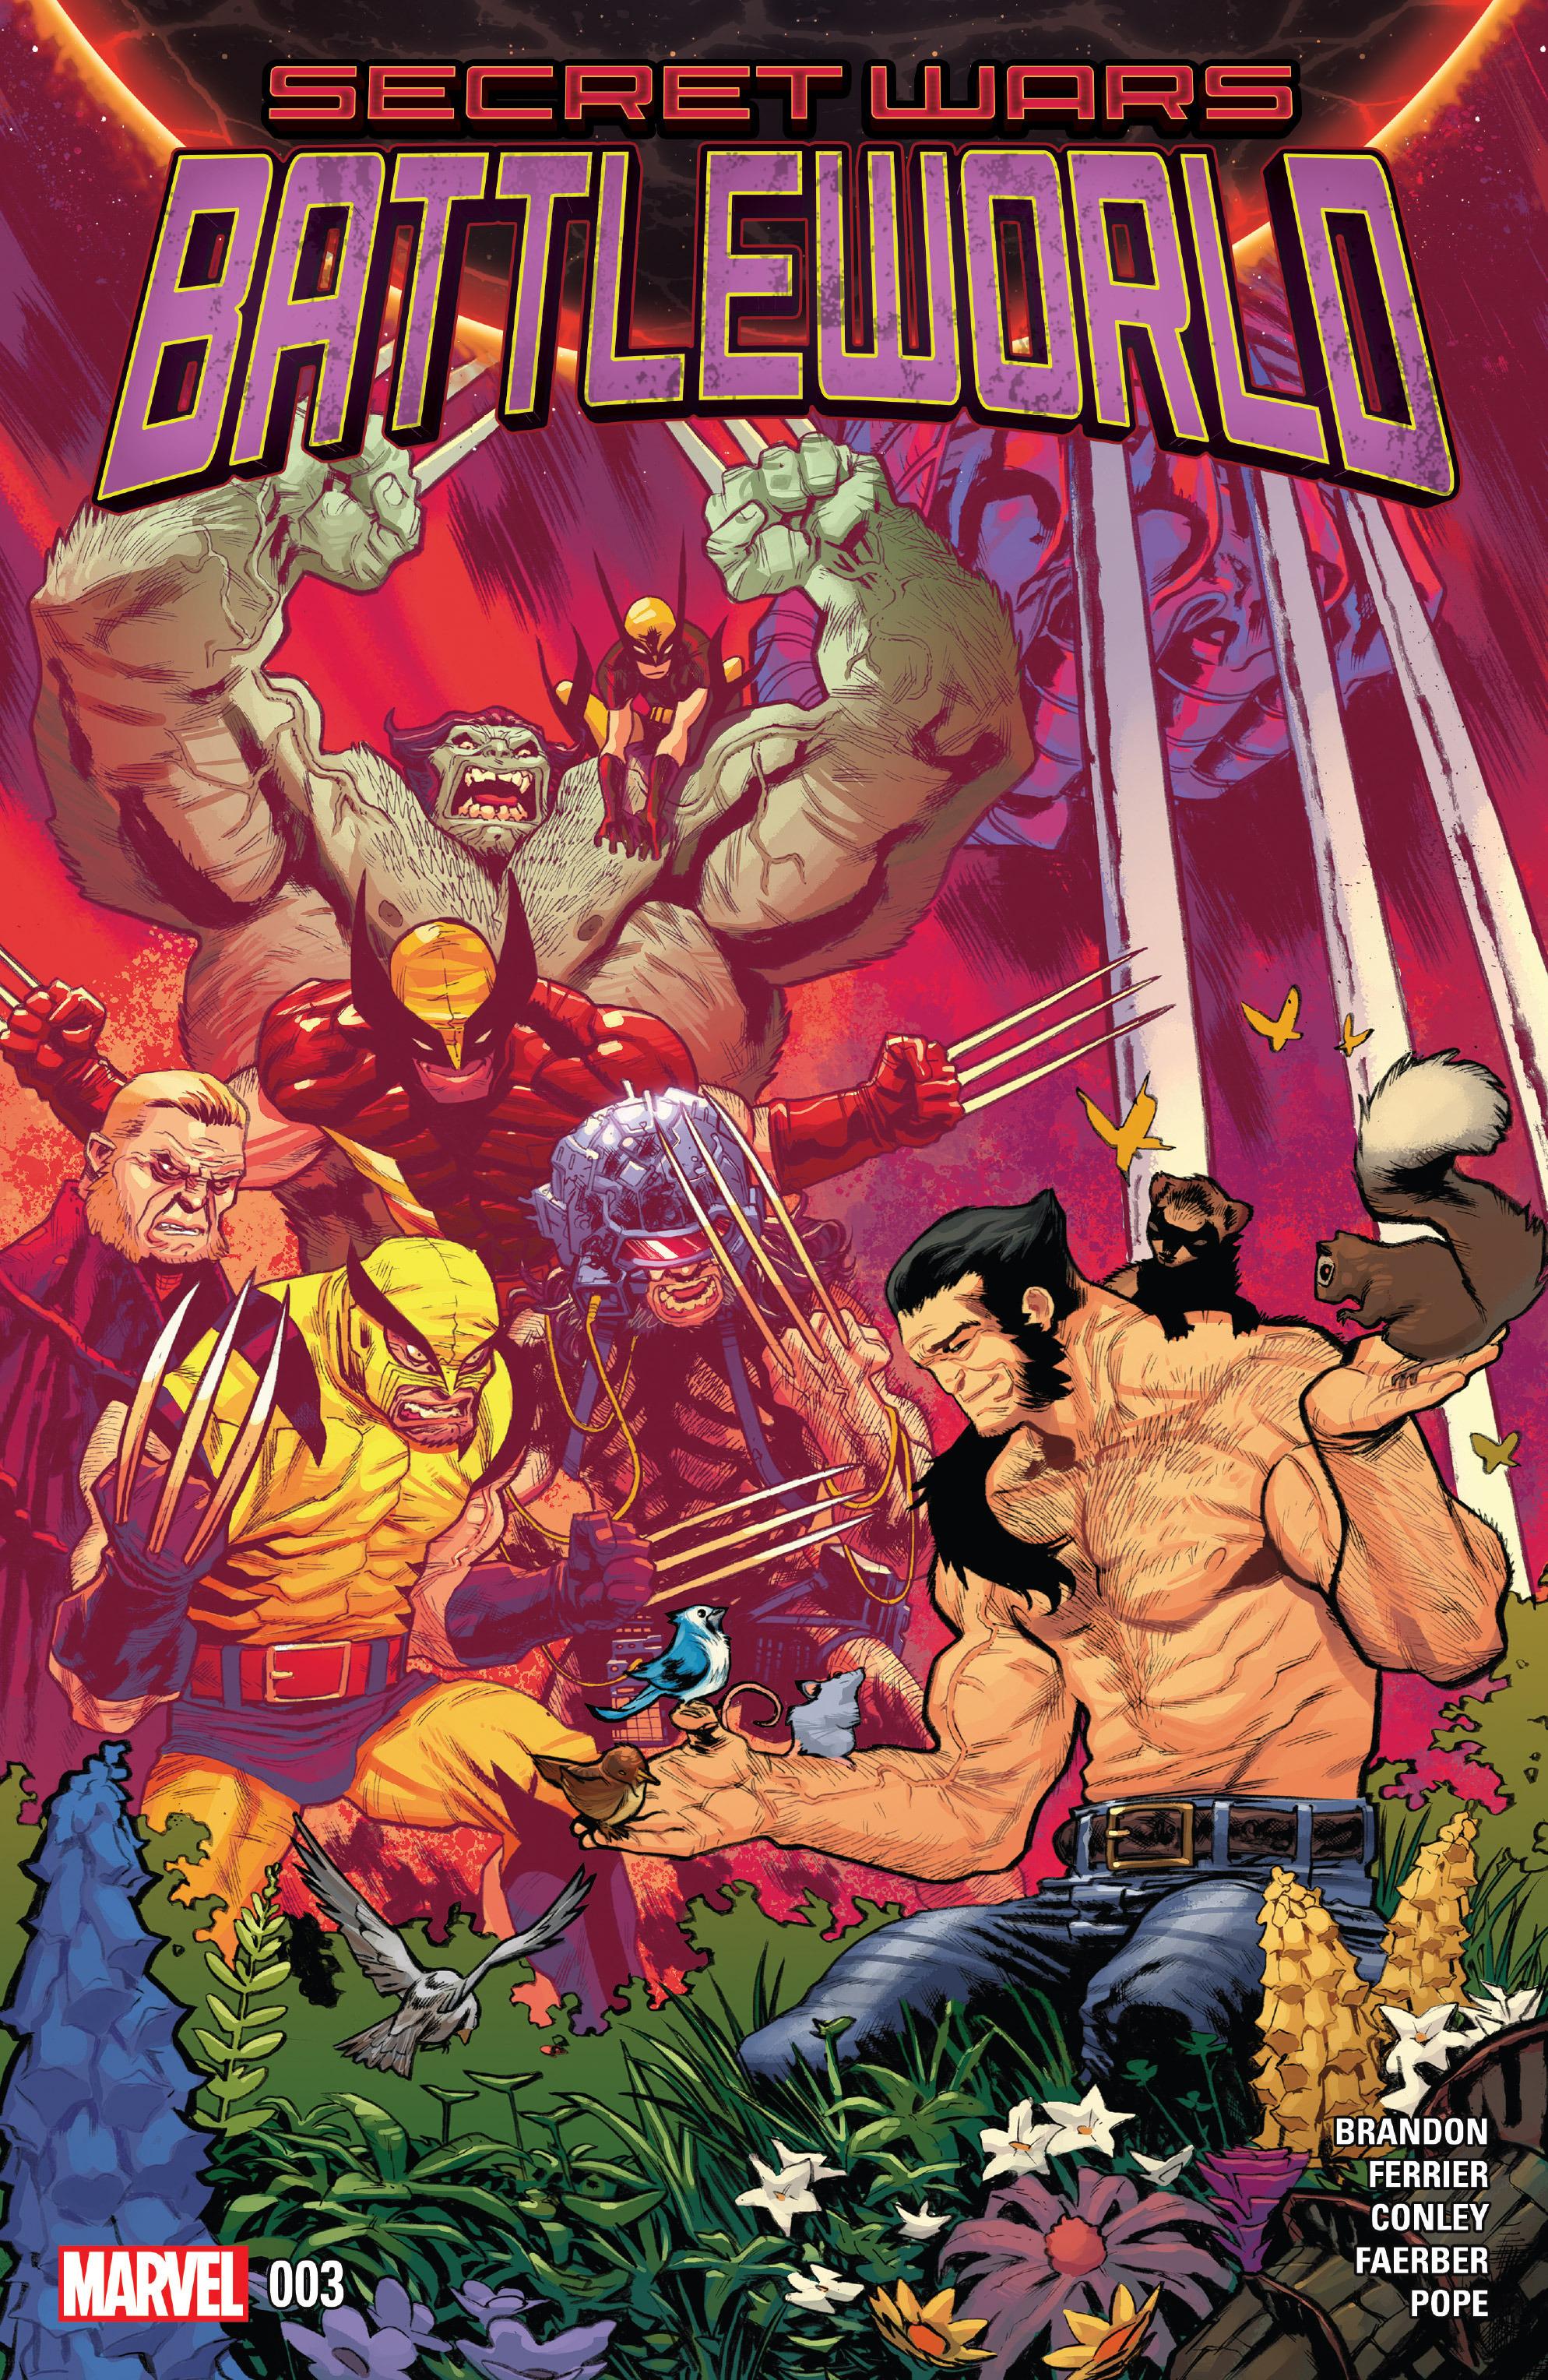 Read online Secret Wars: Battleworld comic -  Issue #3 - 1